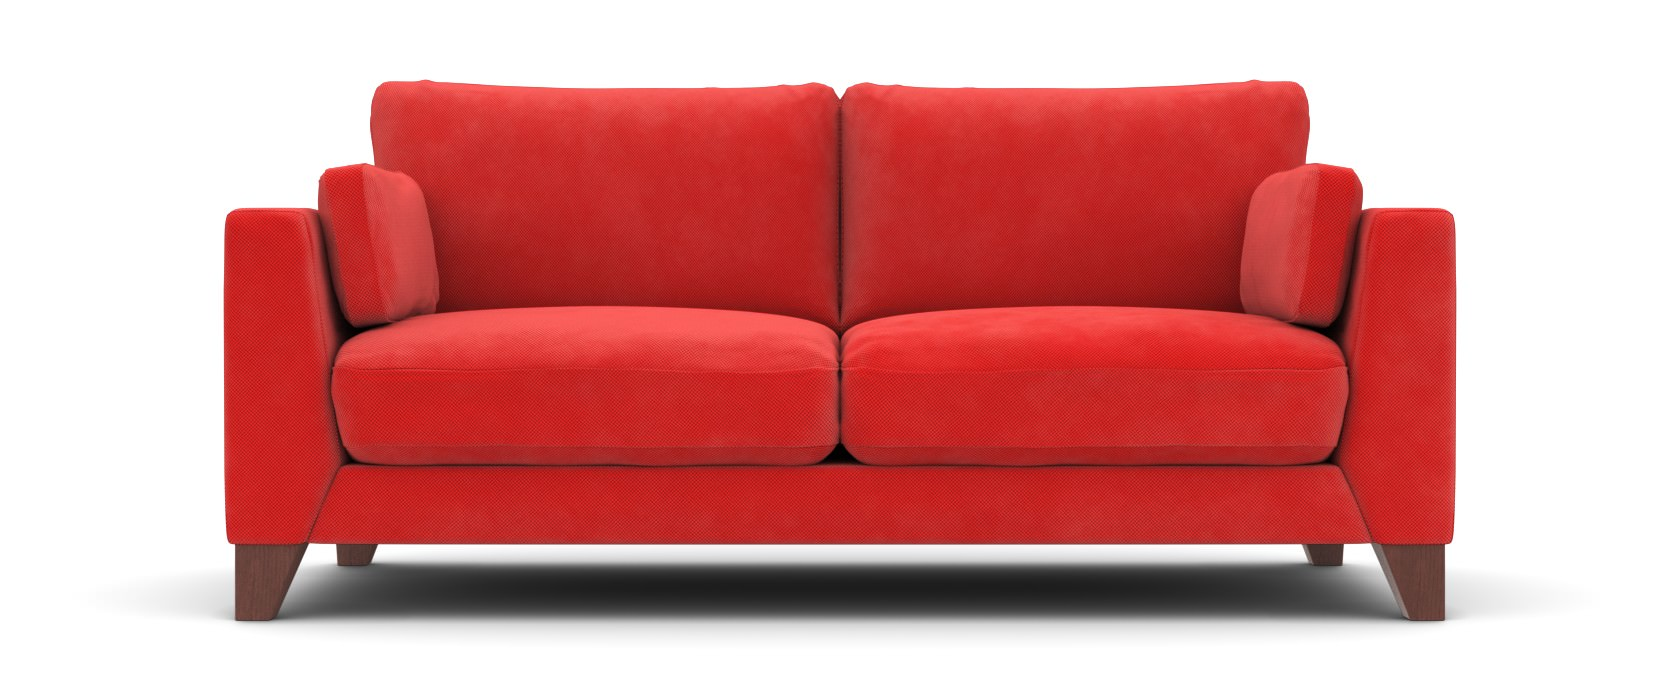 Двомісний диван Paolo - Pufetto